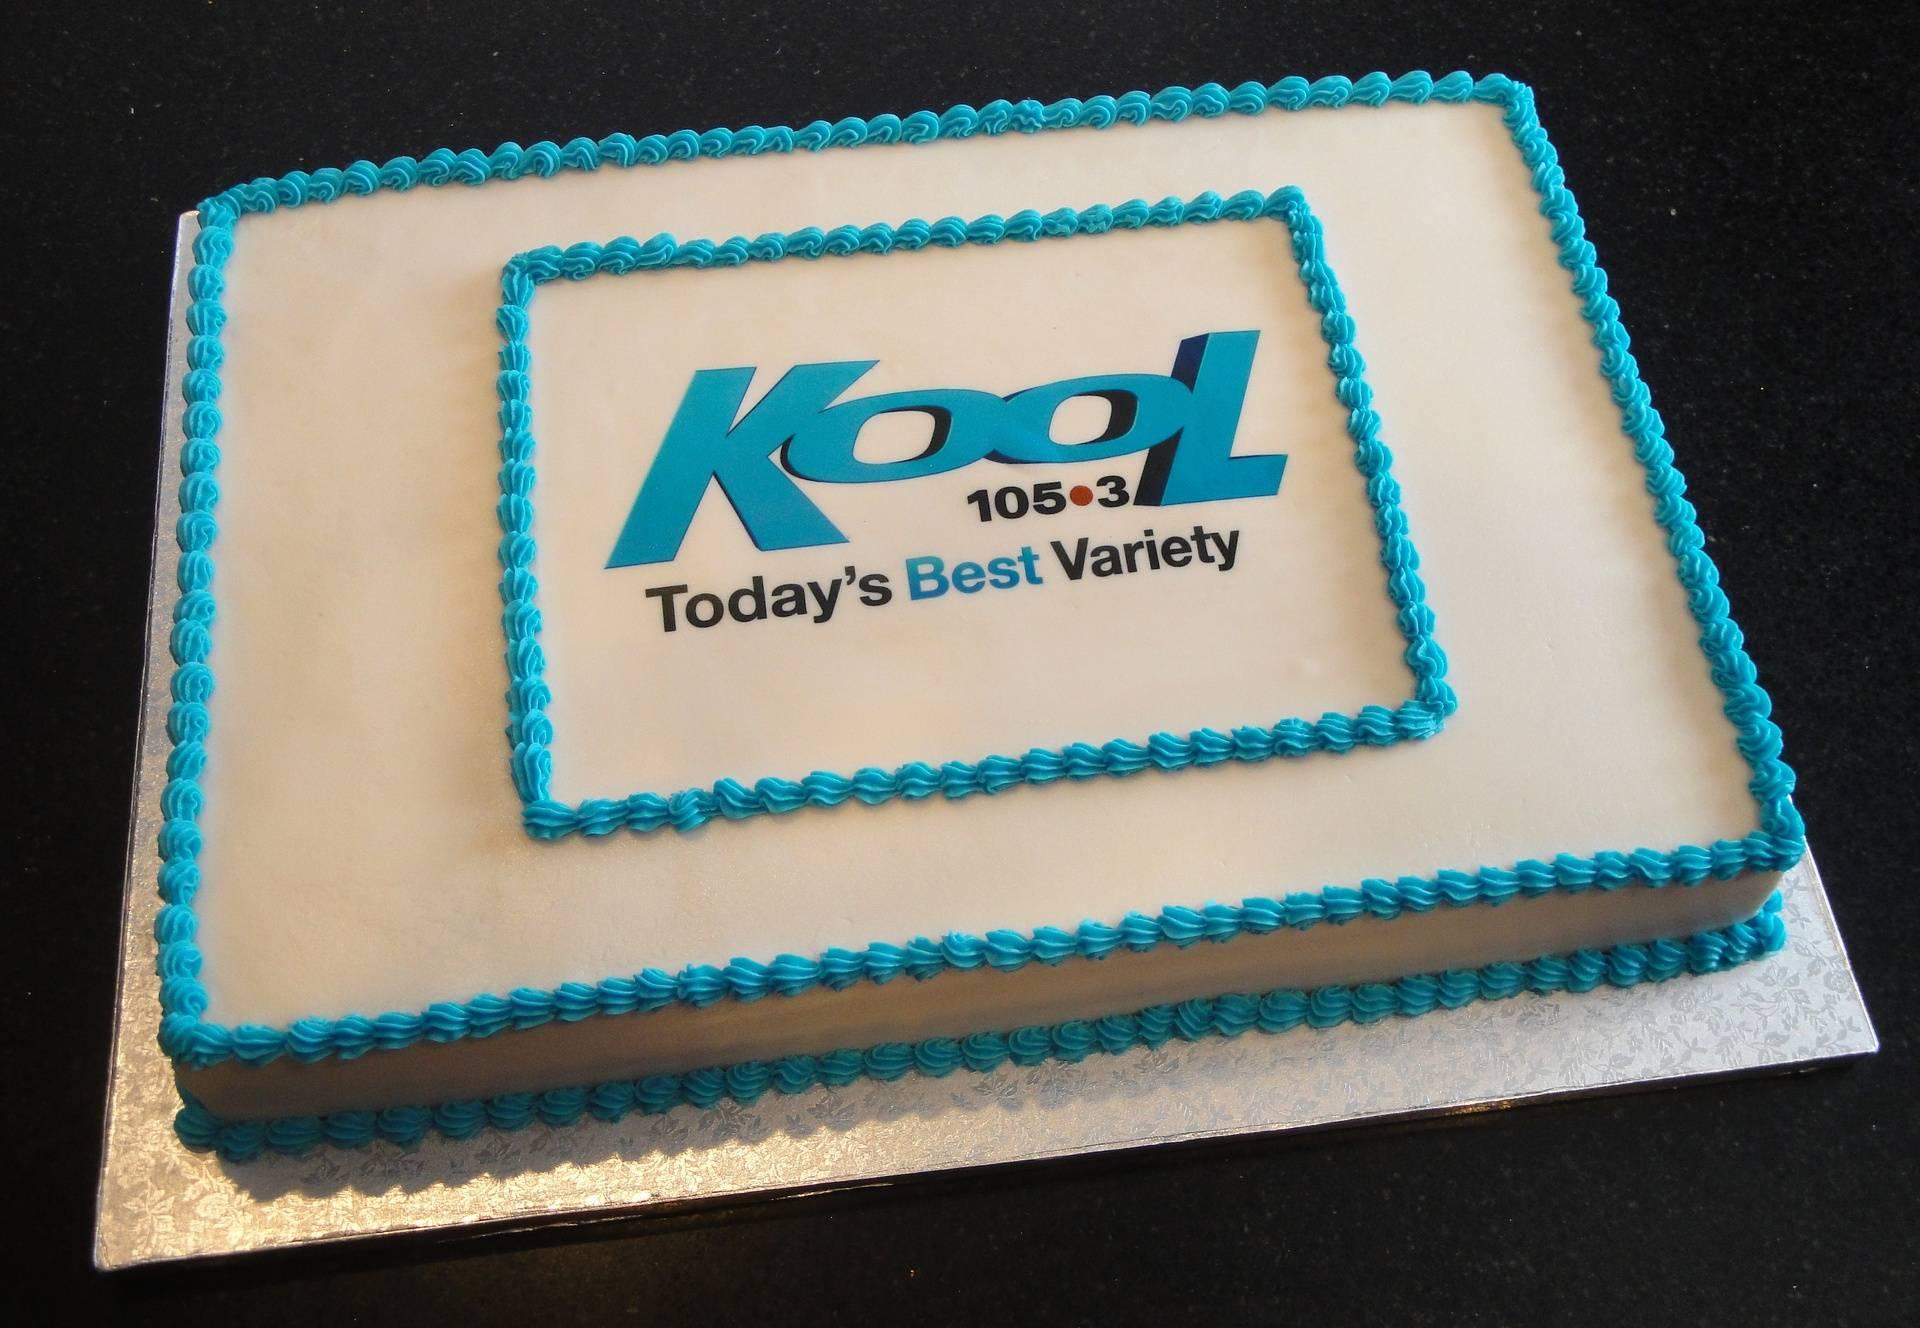 Kool 105.3 Cake